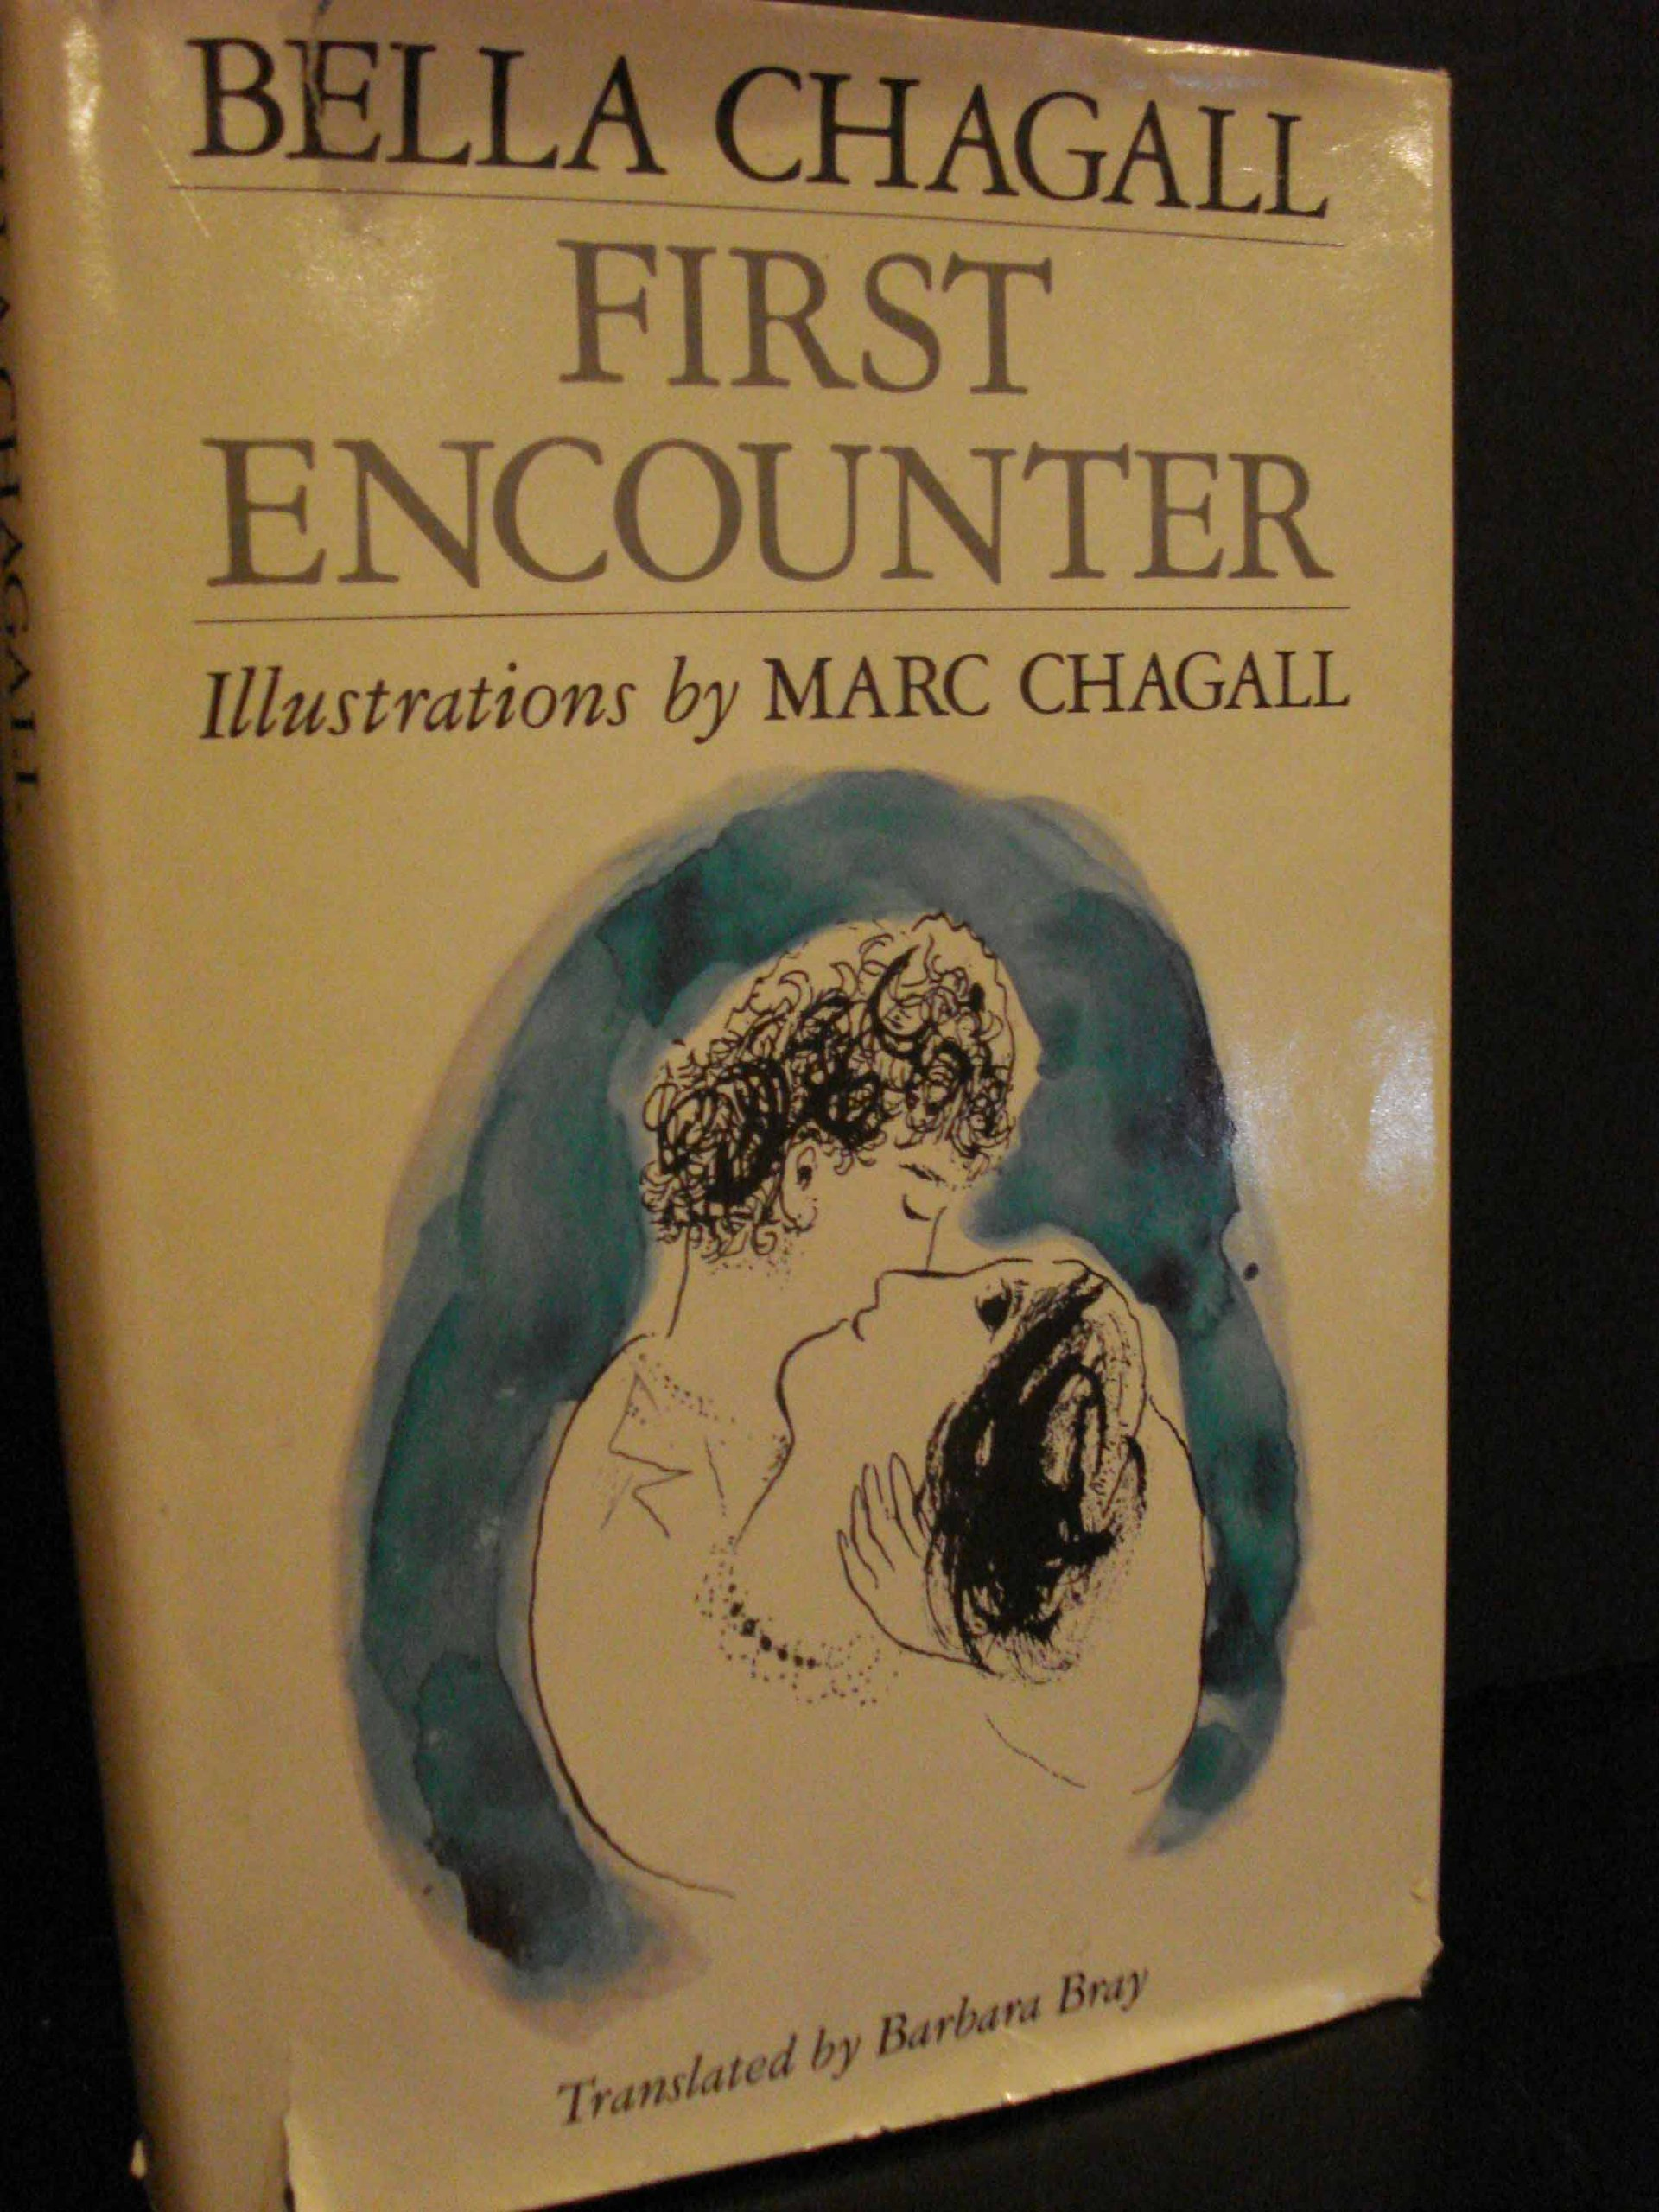 bella chagall ebook